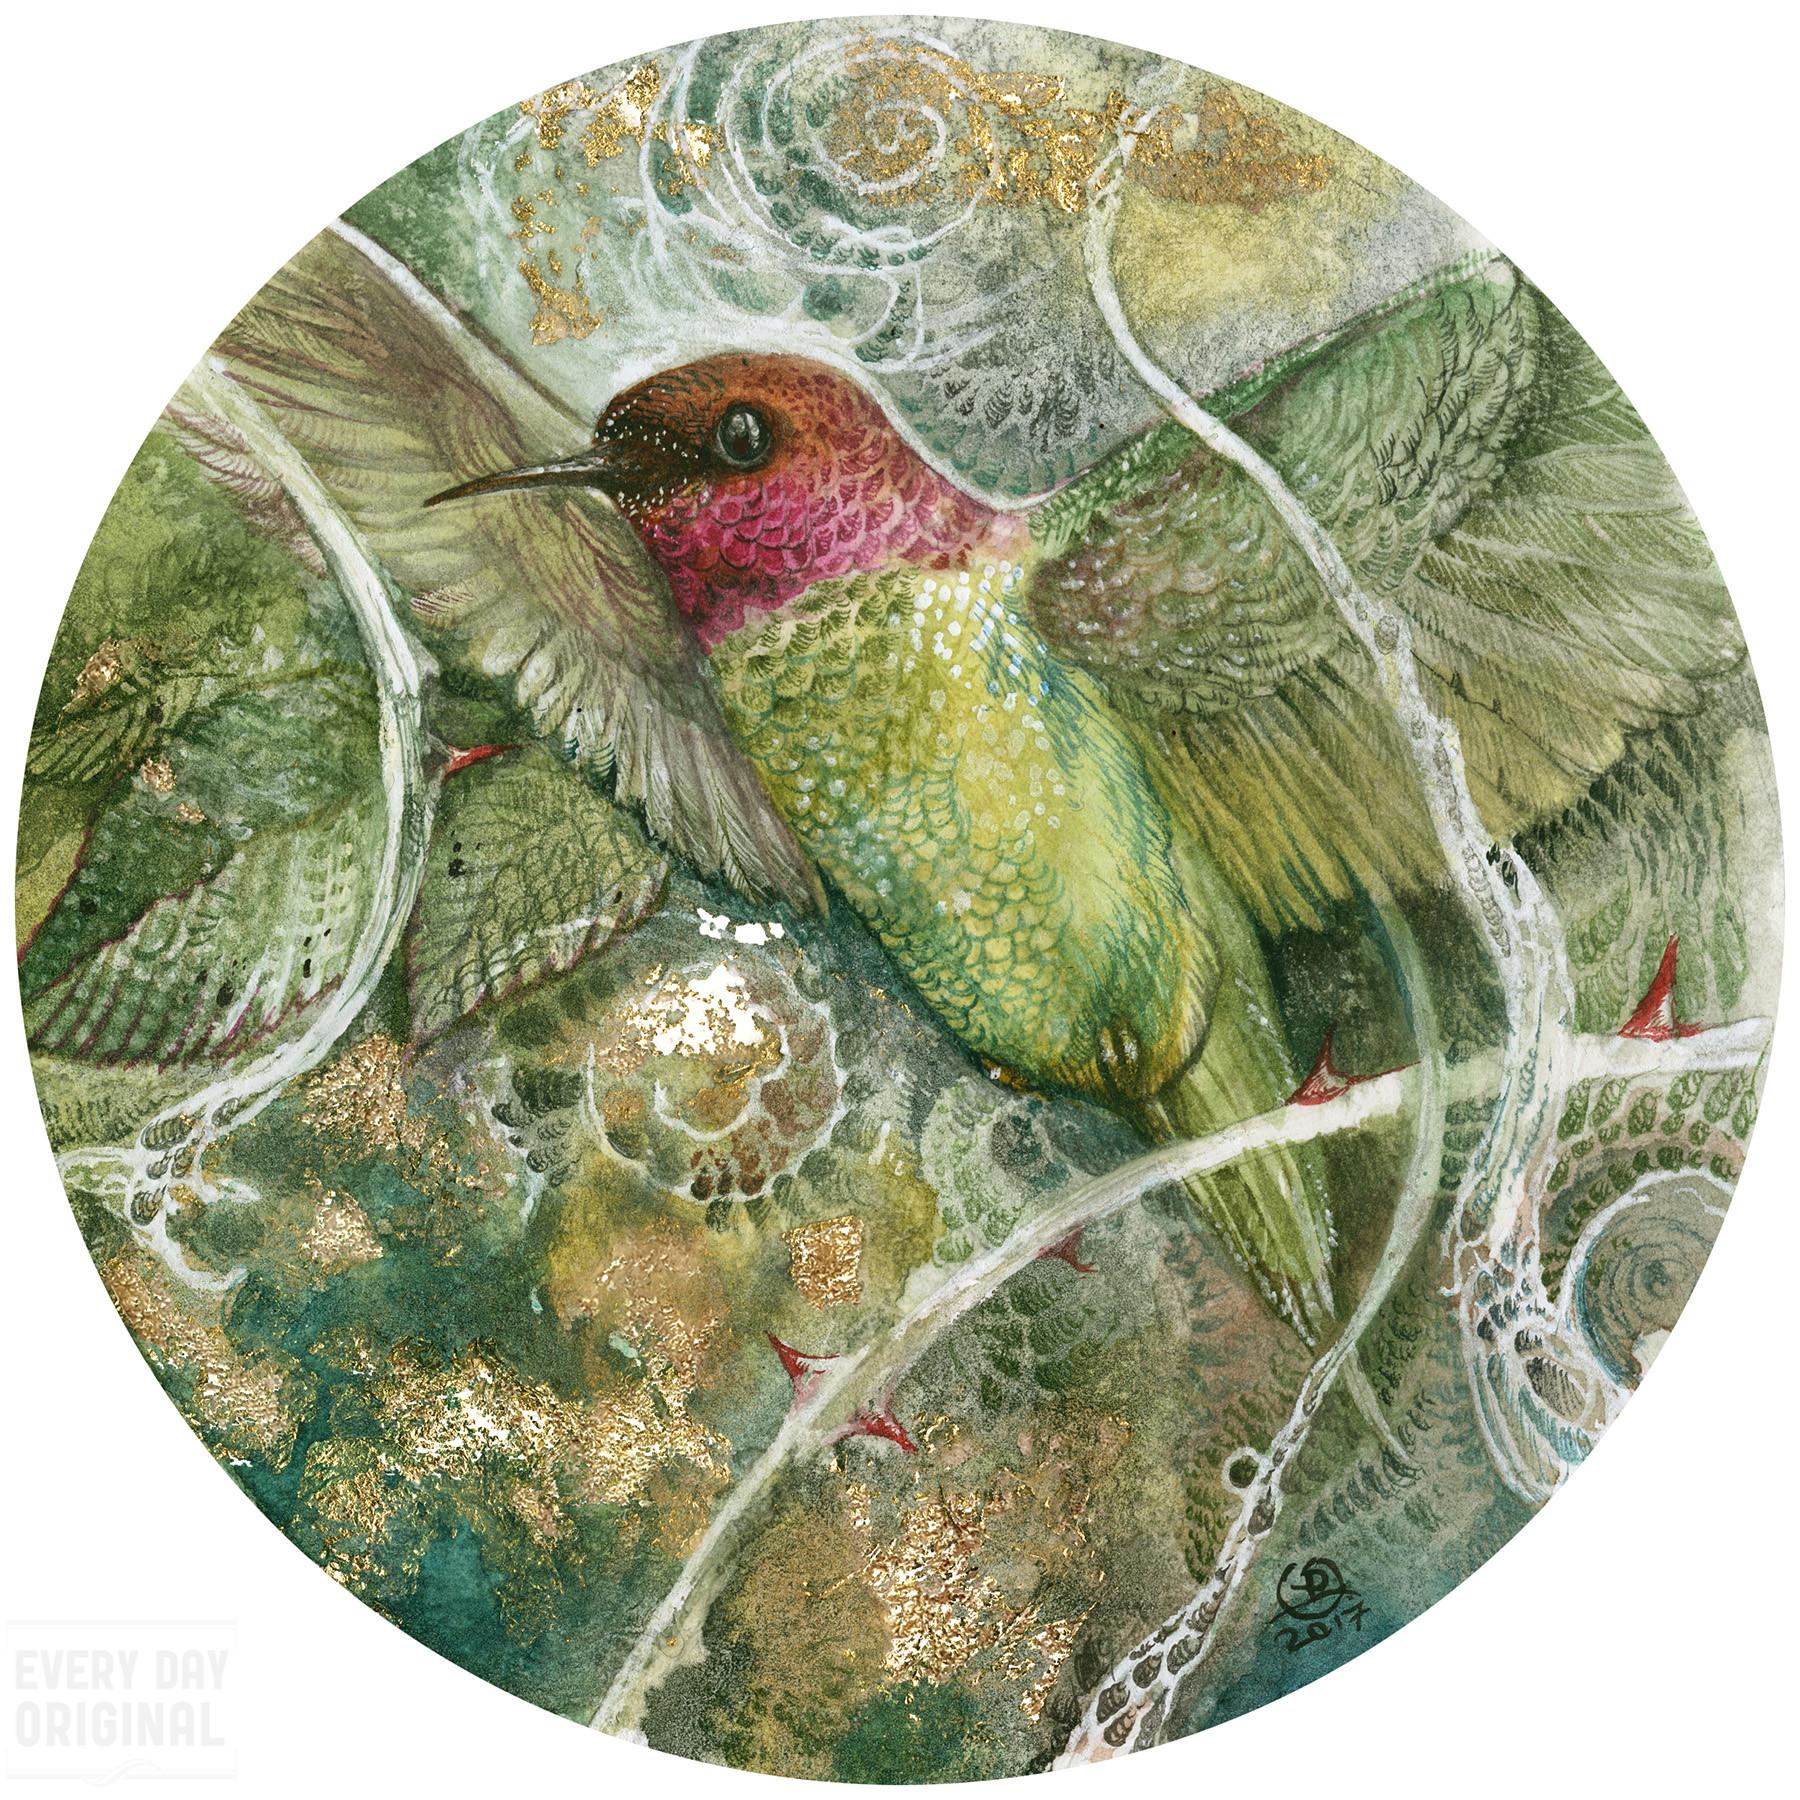 Hummingbird by Stephanie Law